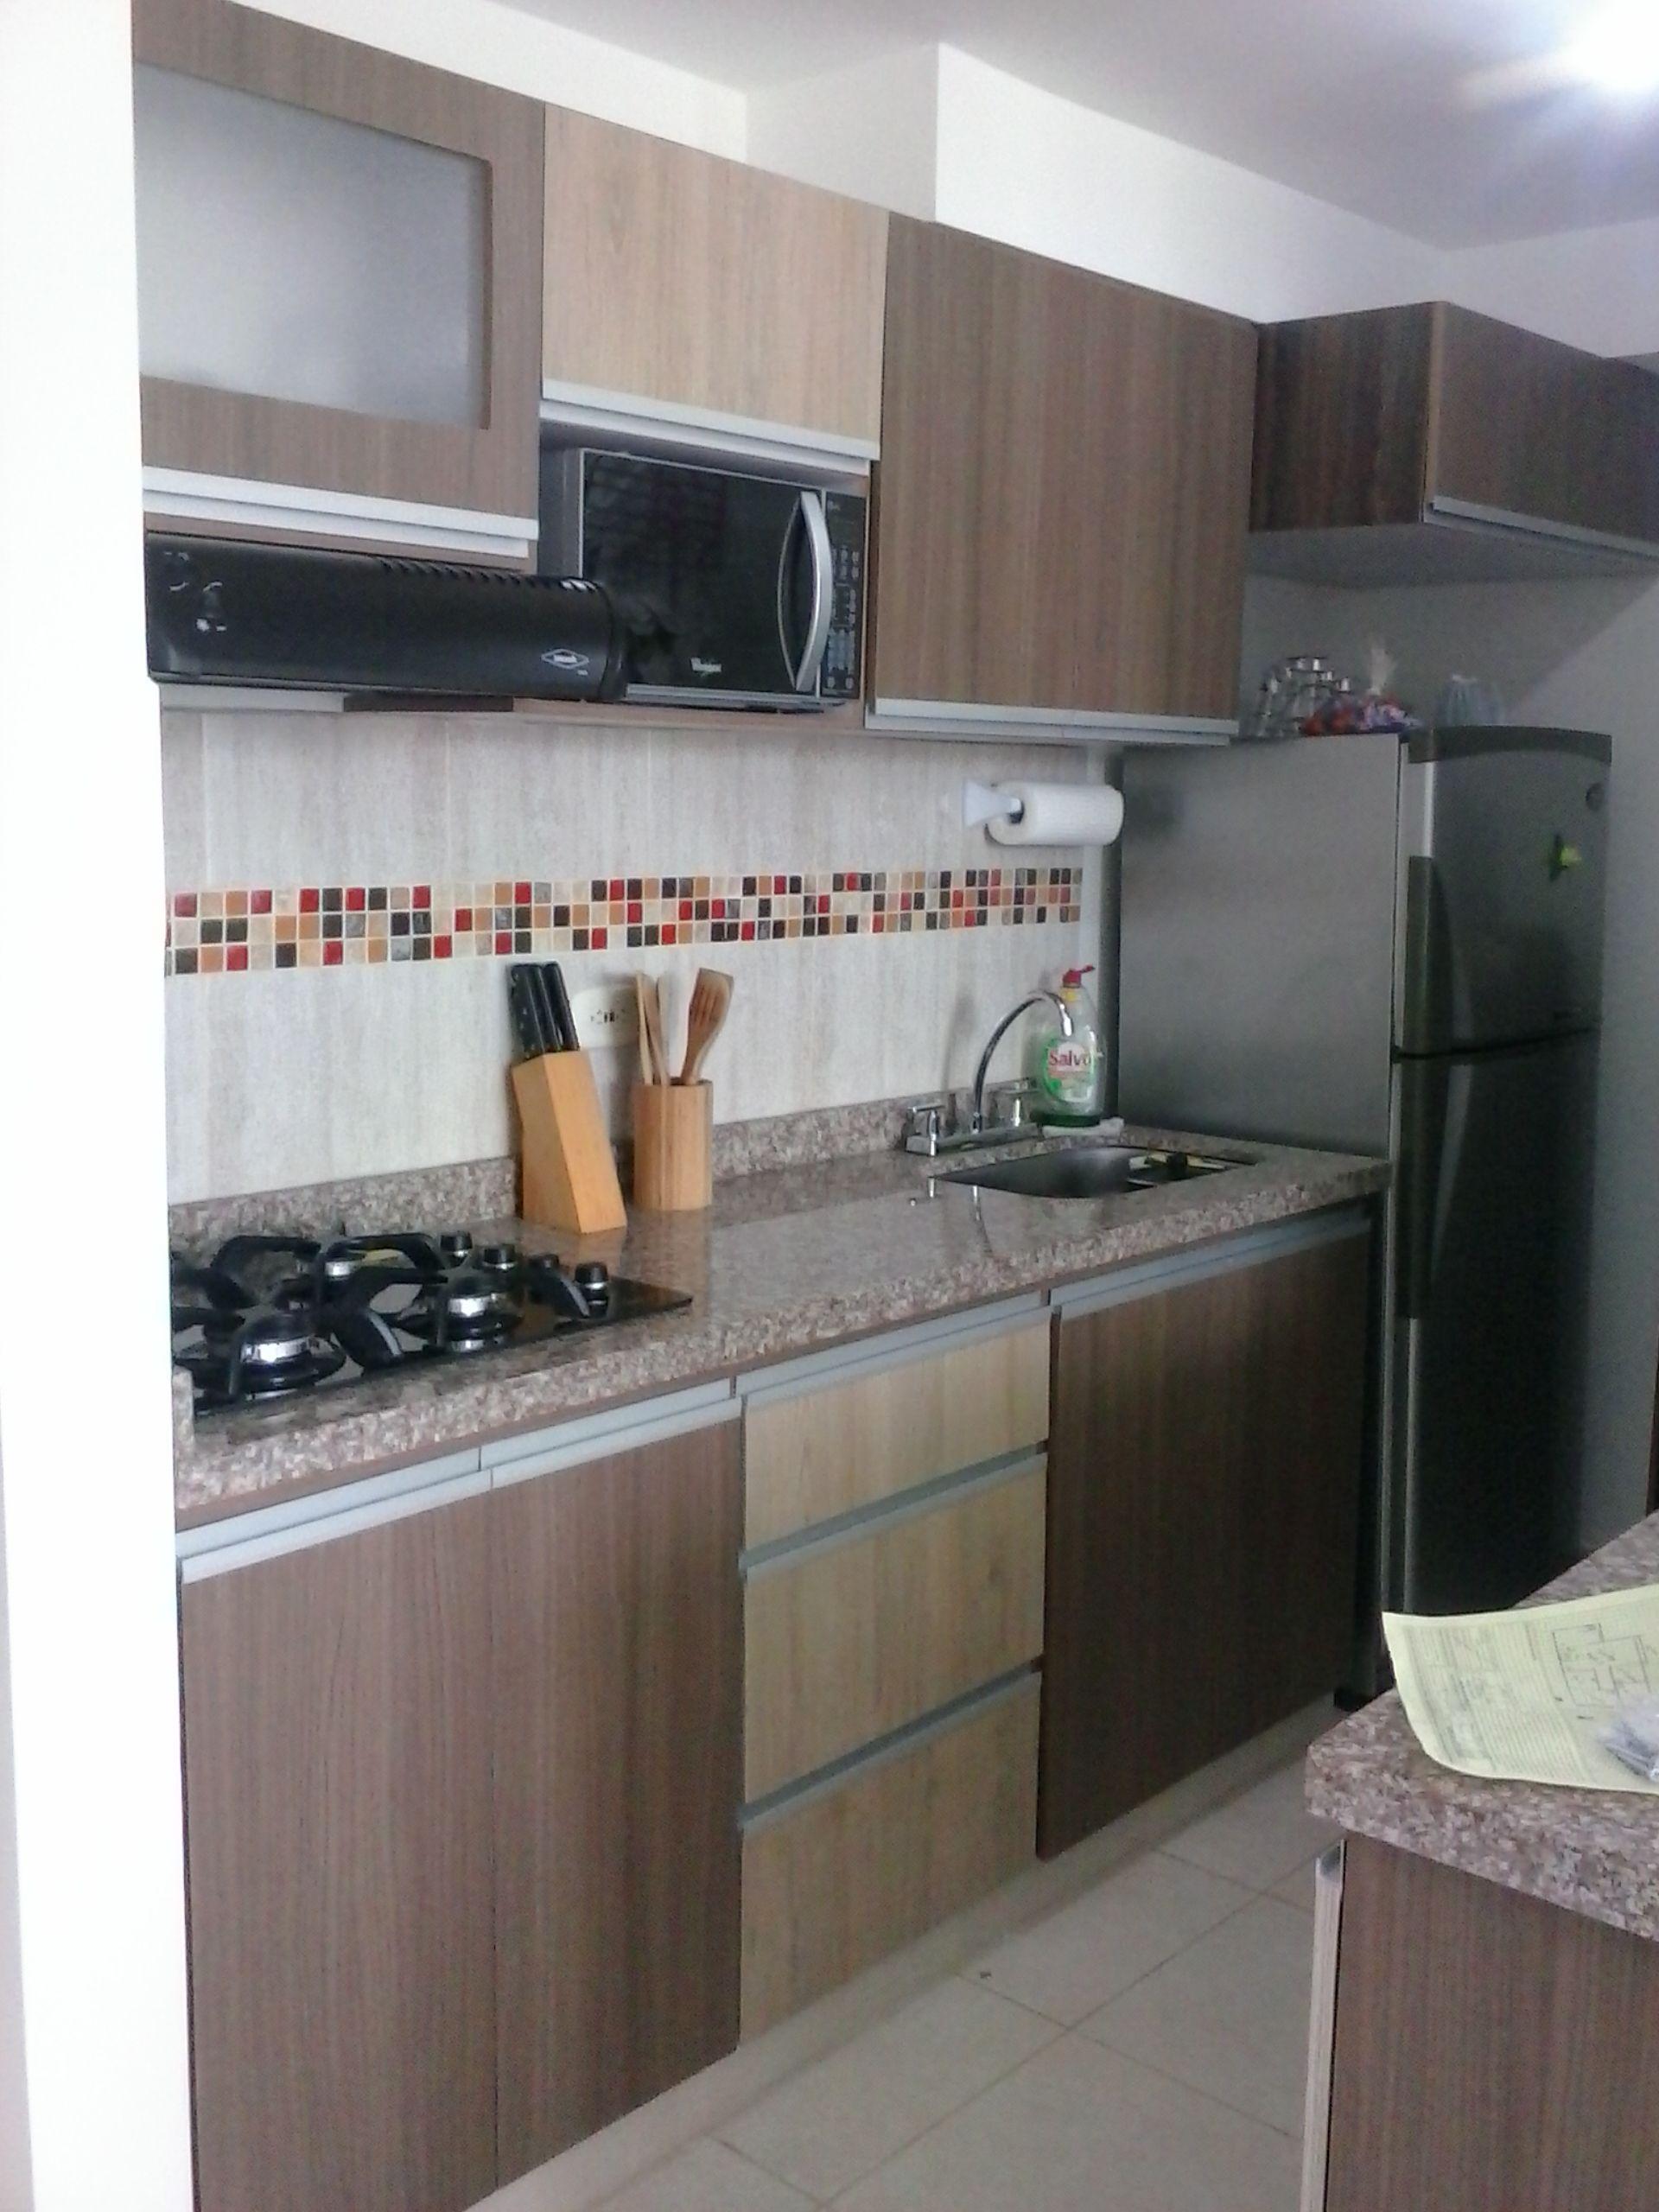 Fabricada por c g arte y decoraci n cocina con meson en for Cocinas modernas en cemento